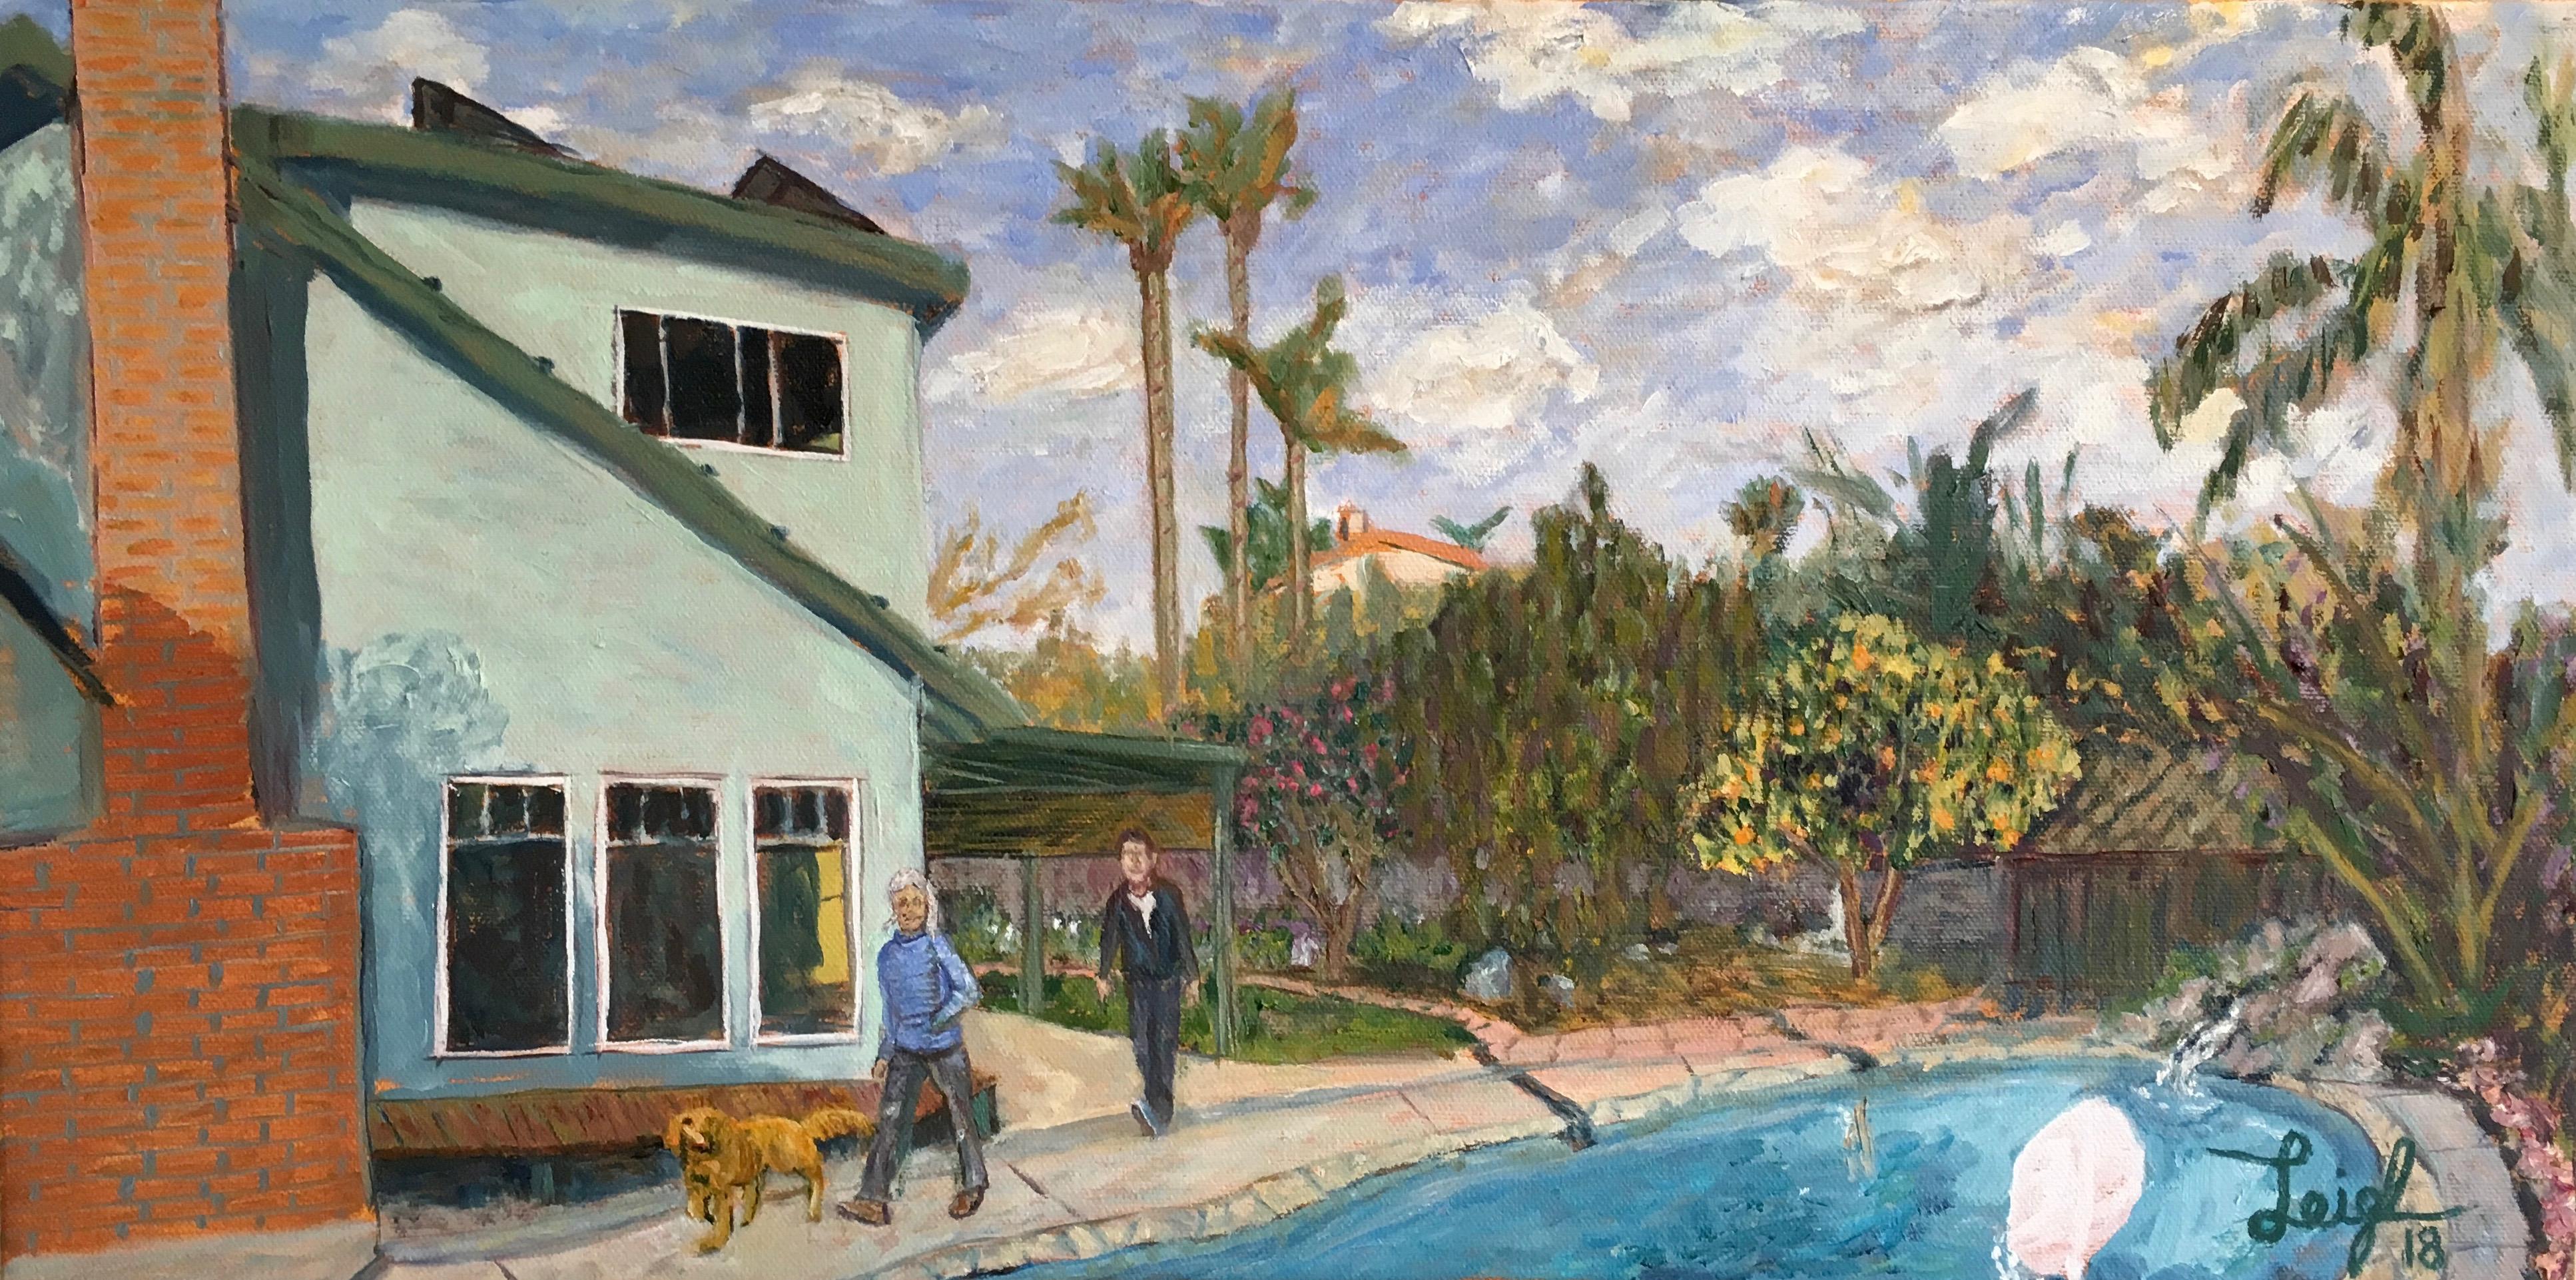 Backyard by the Pool  ~   2018  •  24 x 18